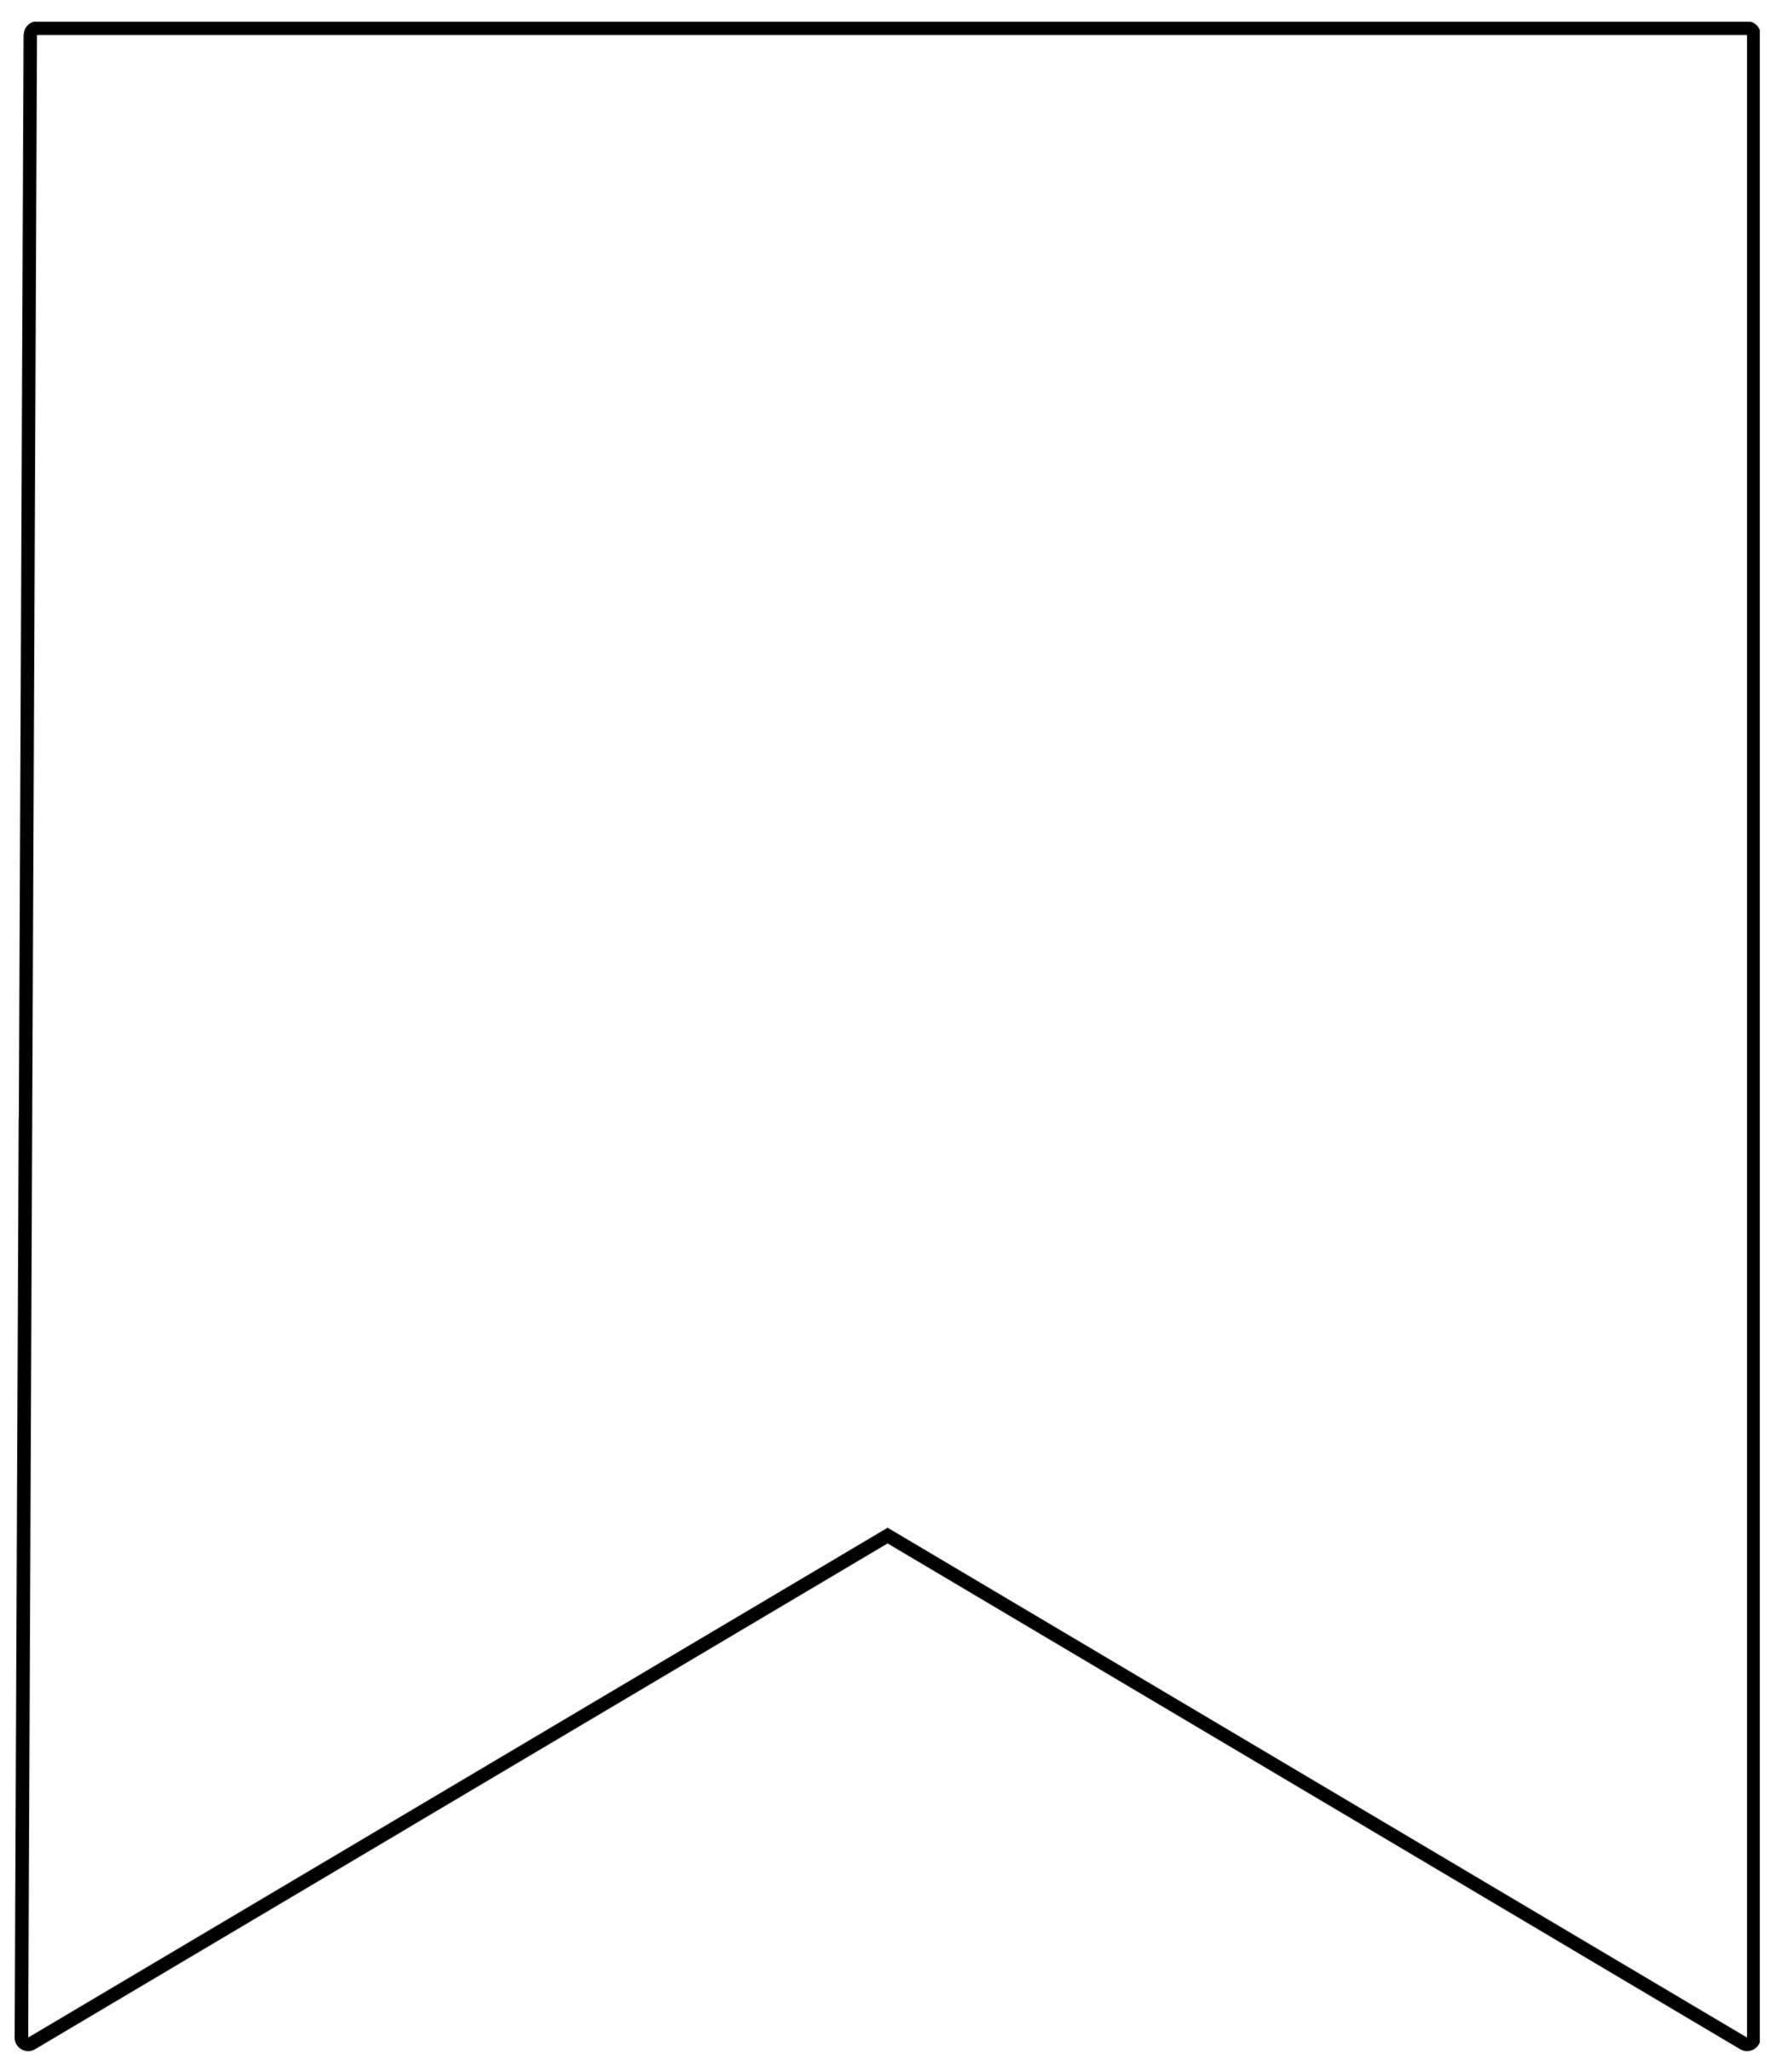 Template Printable Pennant Banner - Epp Acp | Free Throughout Free Printable Pennant Banner Template